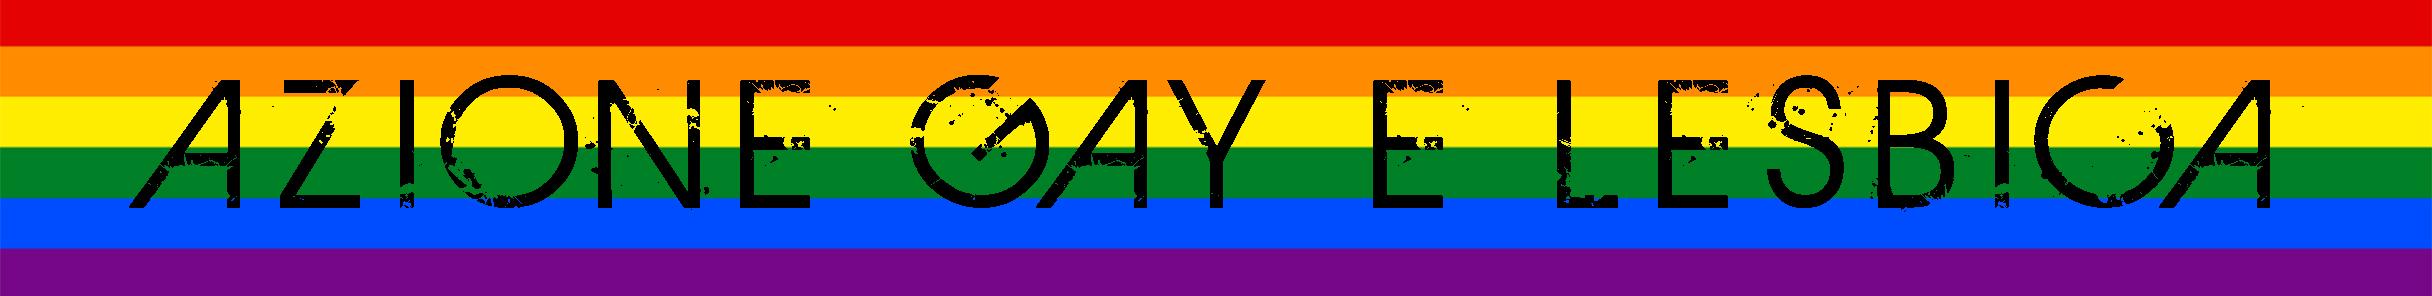 incontri gay siti Firenze